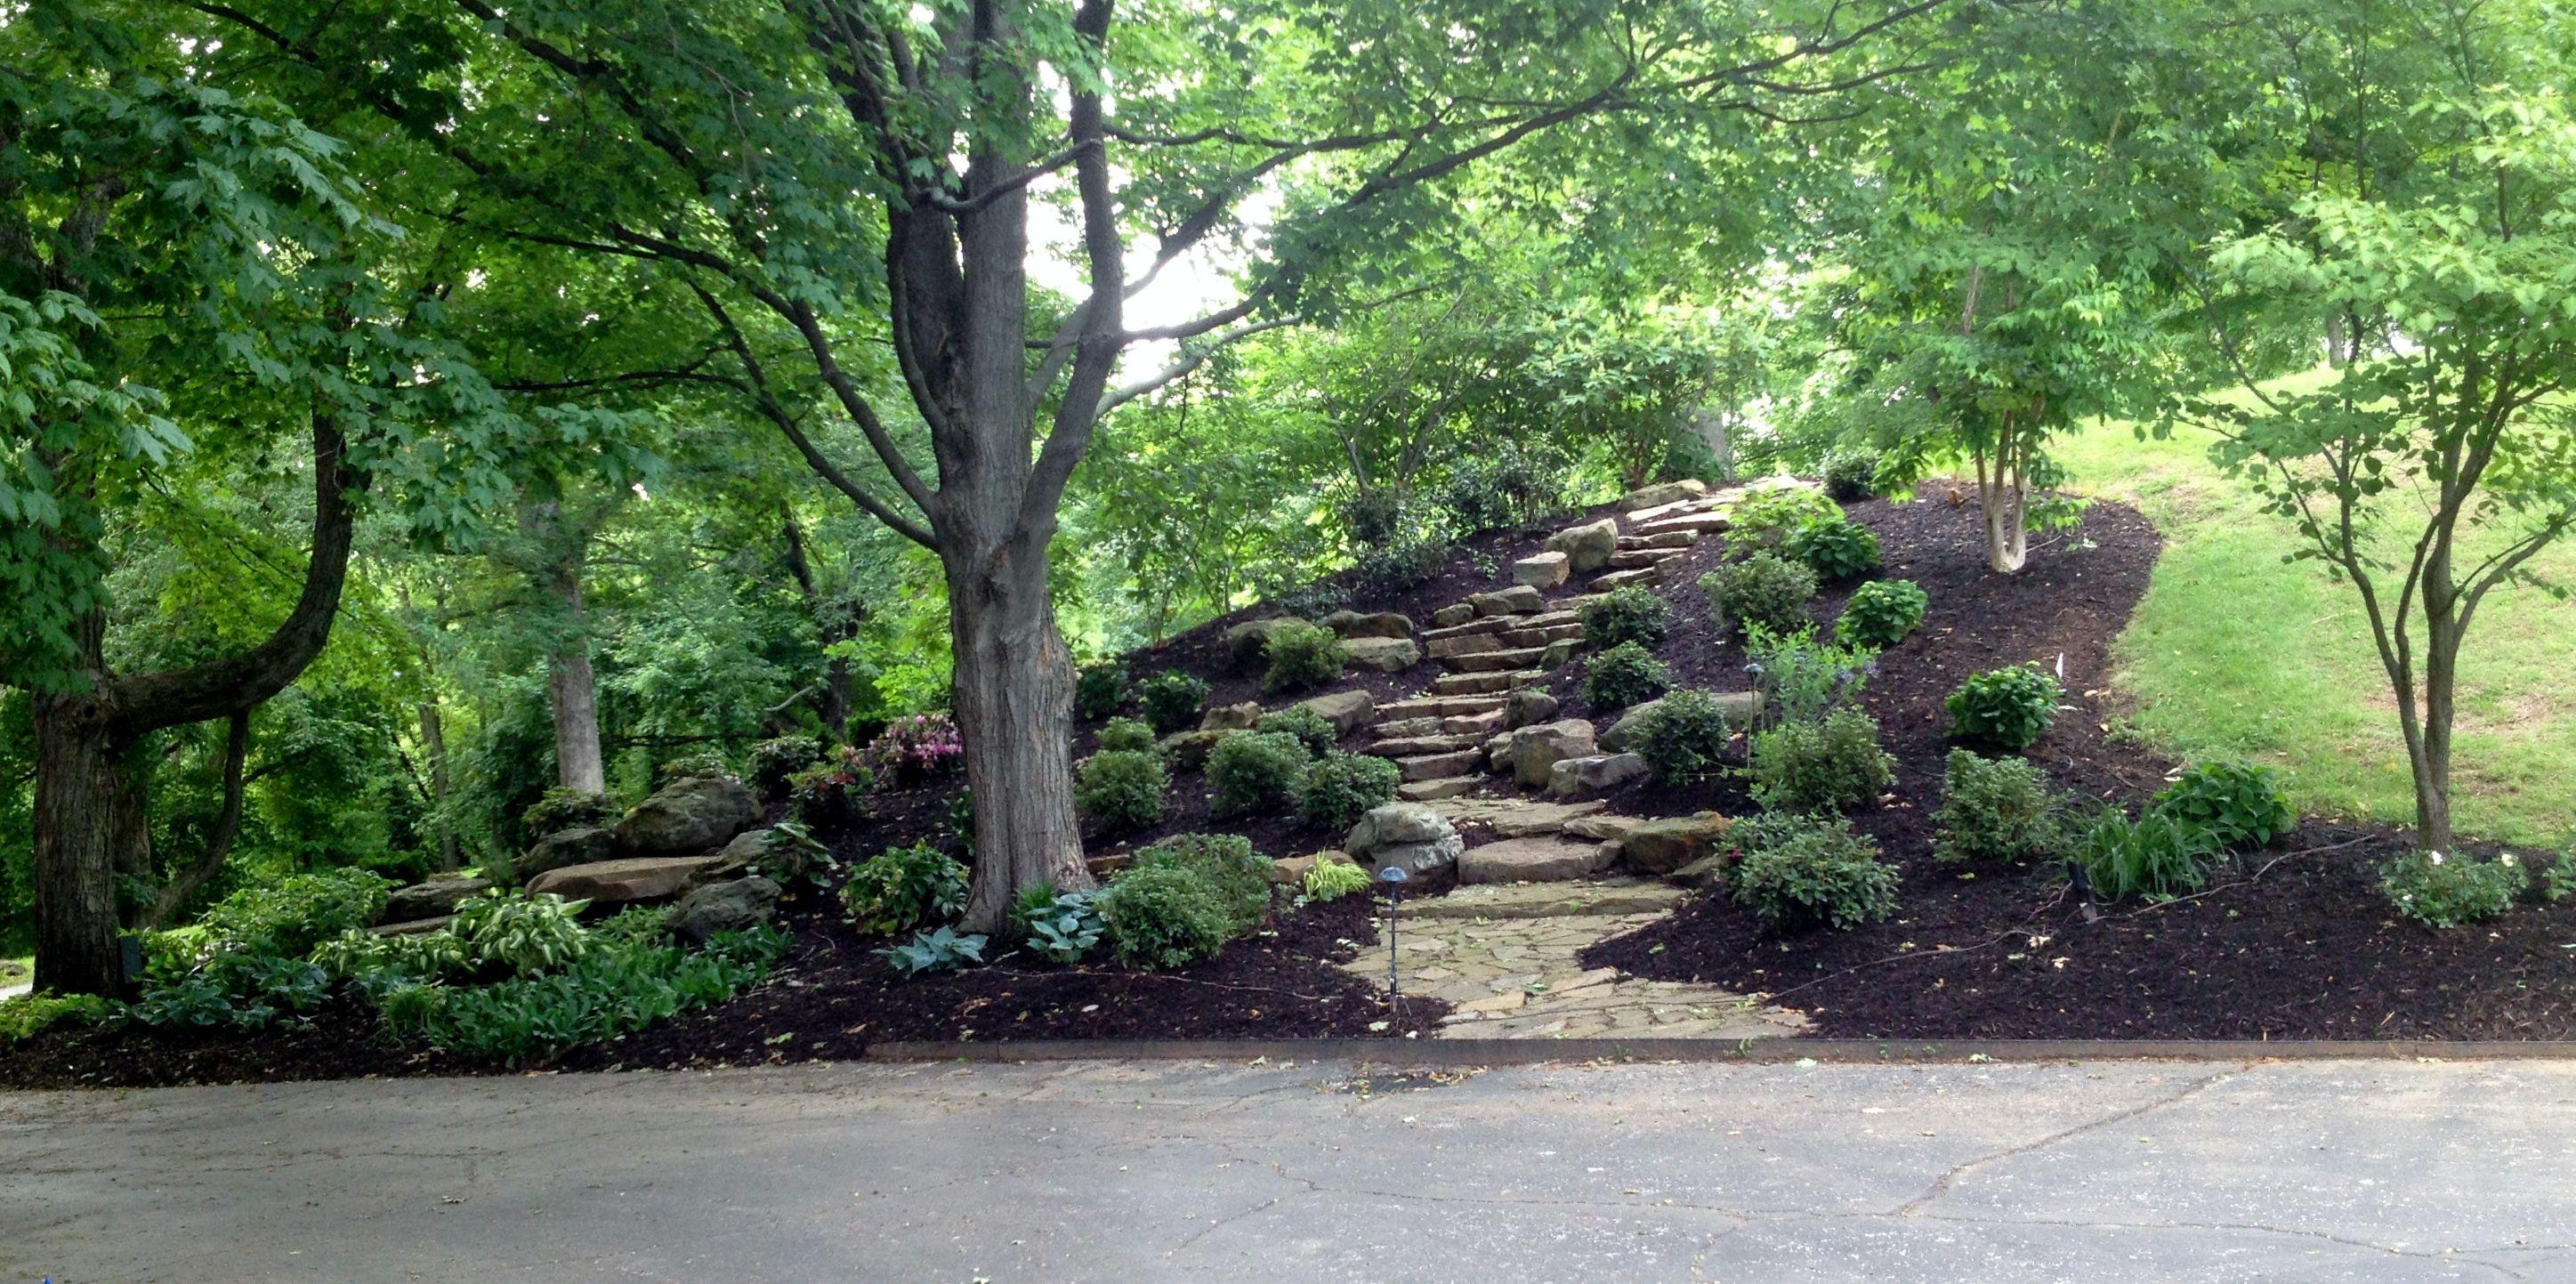 How to landscape a hillside - 17 Best Images About Gardening On Pinterest Gardens Hillside